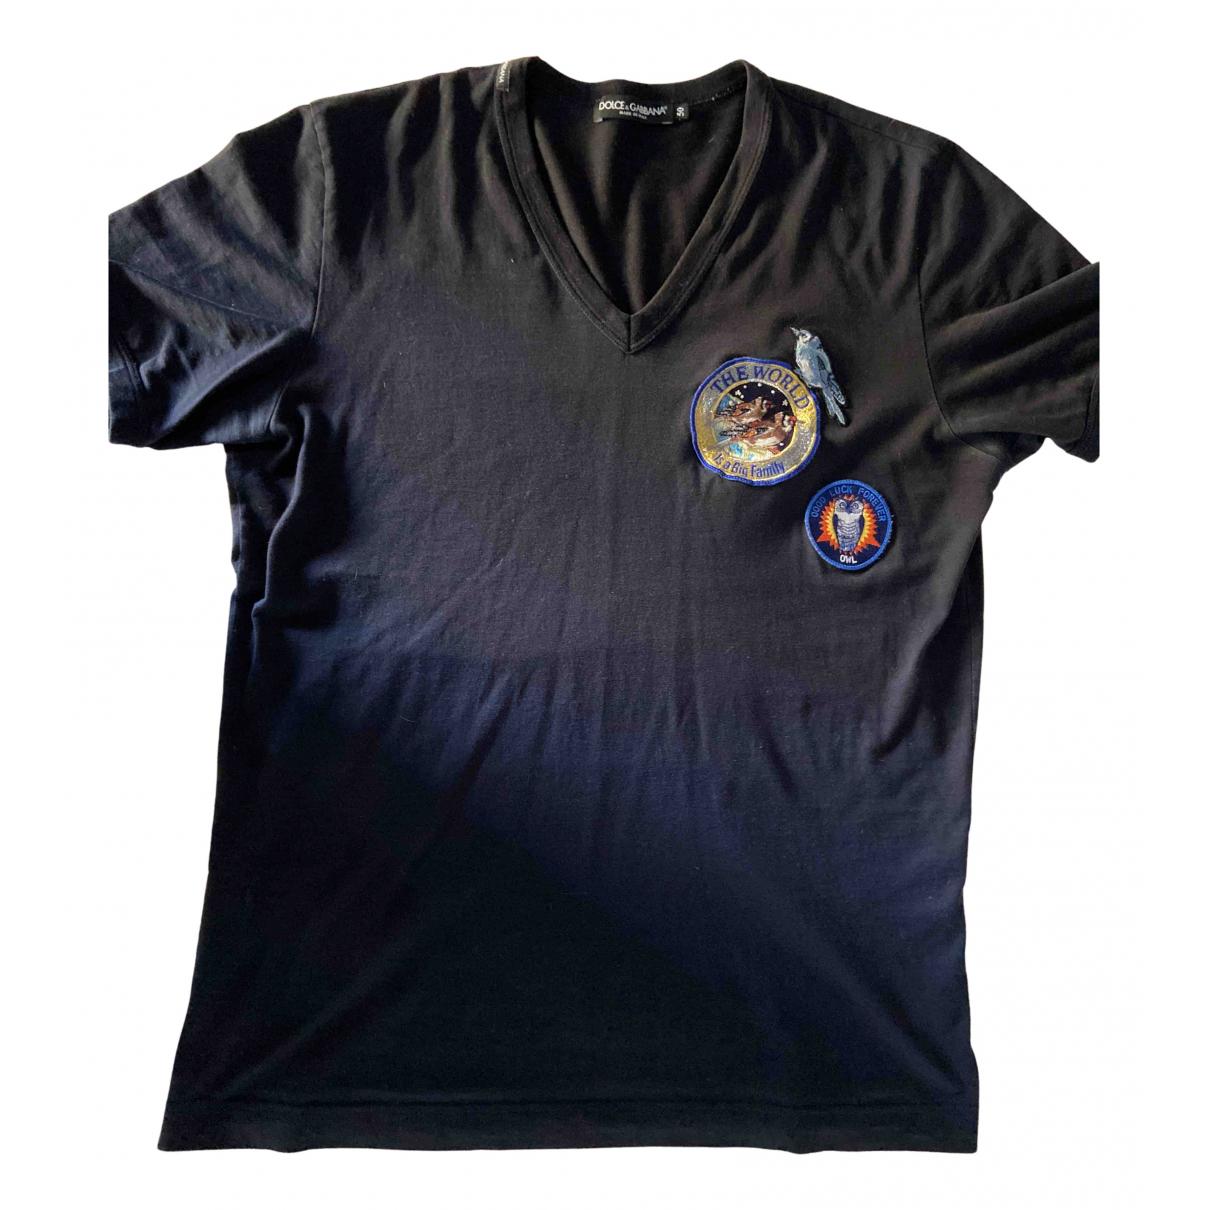 Dolce & Gabbana - Tee shirts   pour homme en coton - bleu